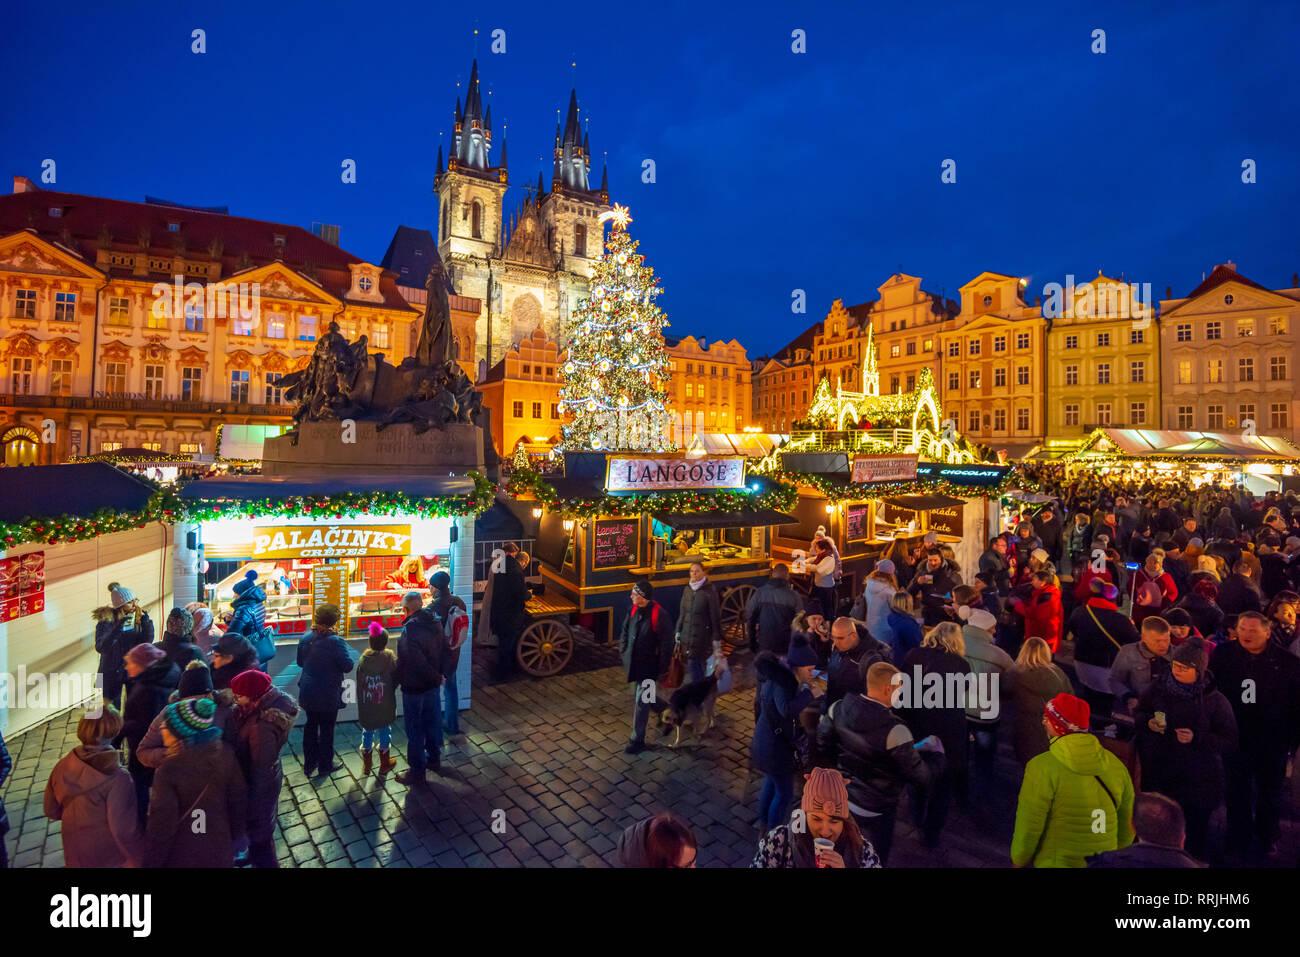 Church of Tyn and Christmas Markets, Staromestske namesti (Old Town Square), Stare Mesto (Old Town), UNESCO, Prague, Czech Republic - Stock Image